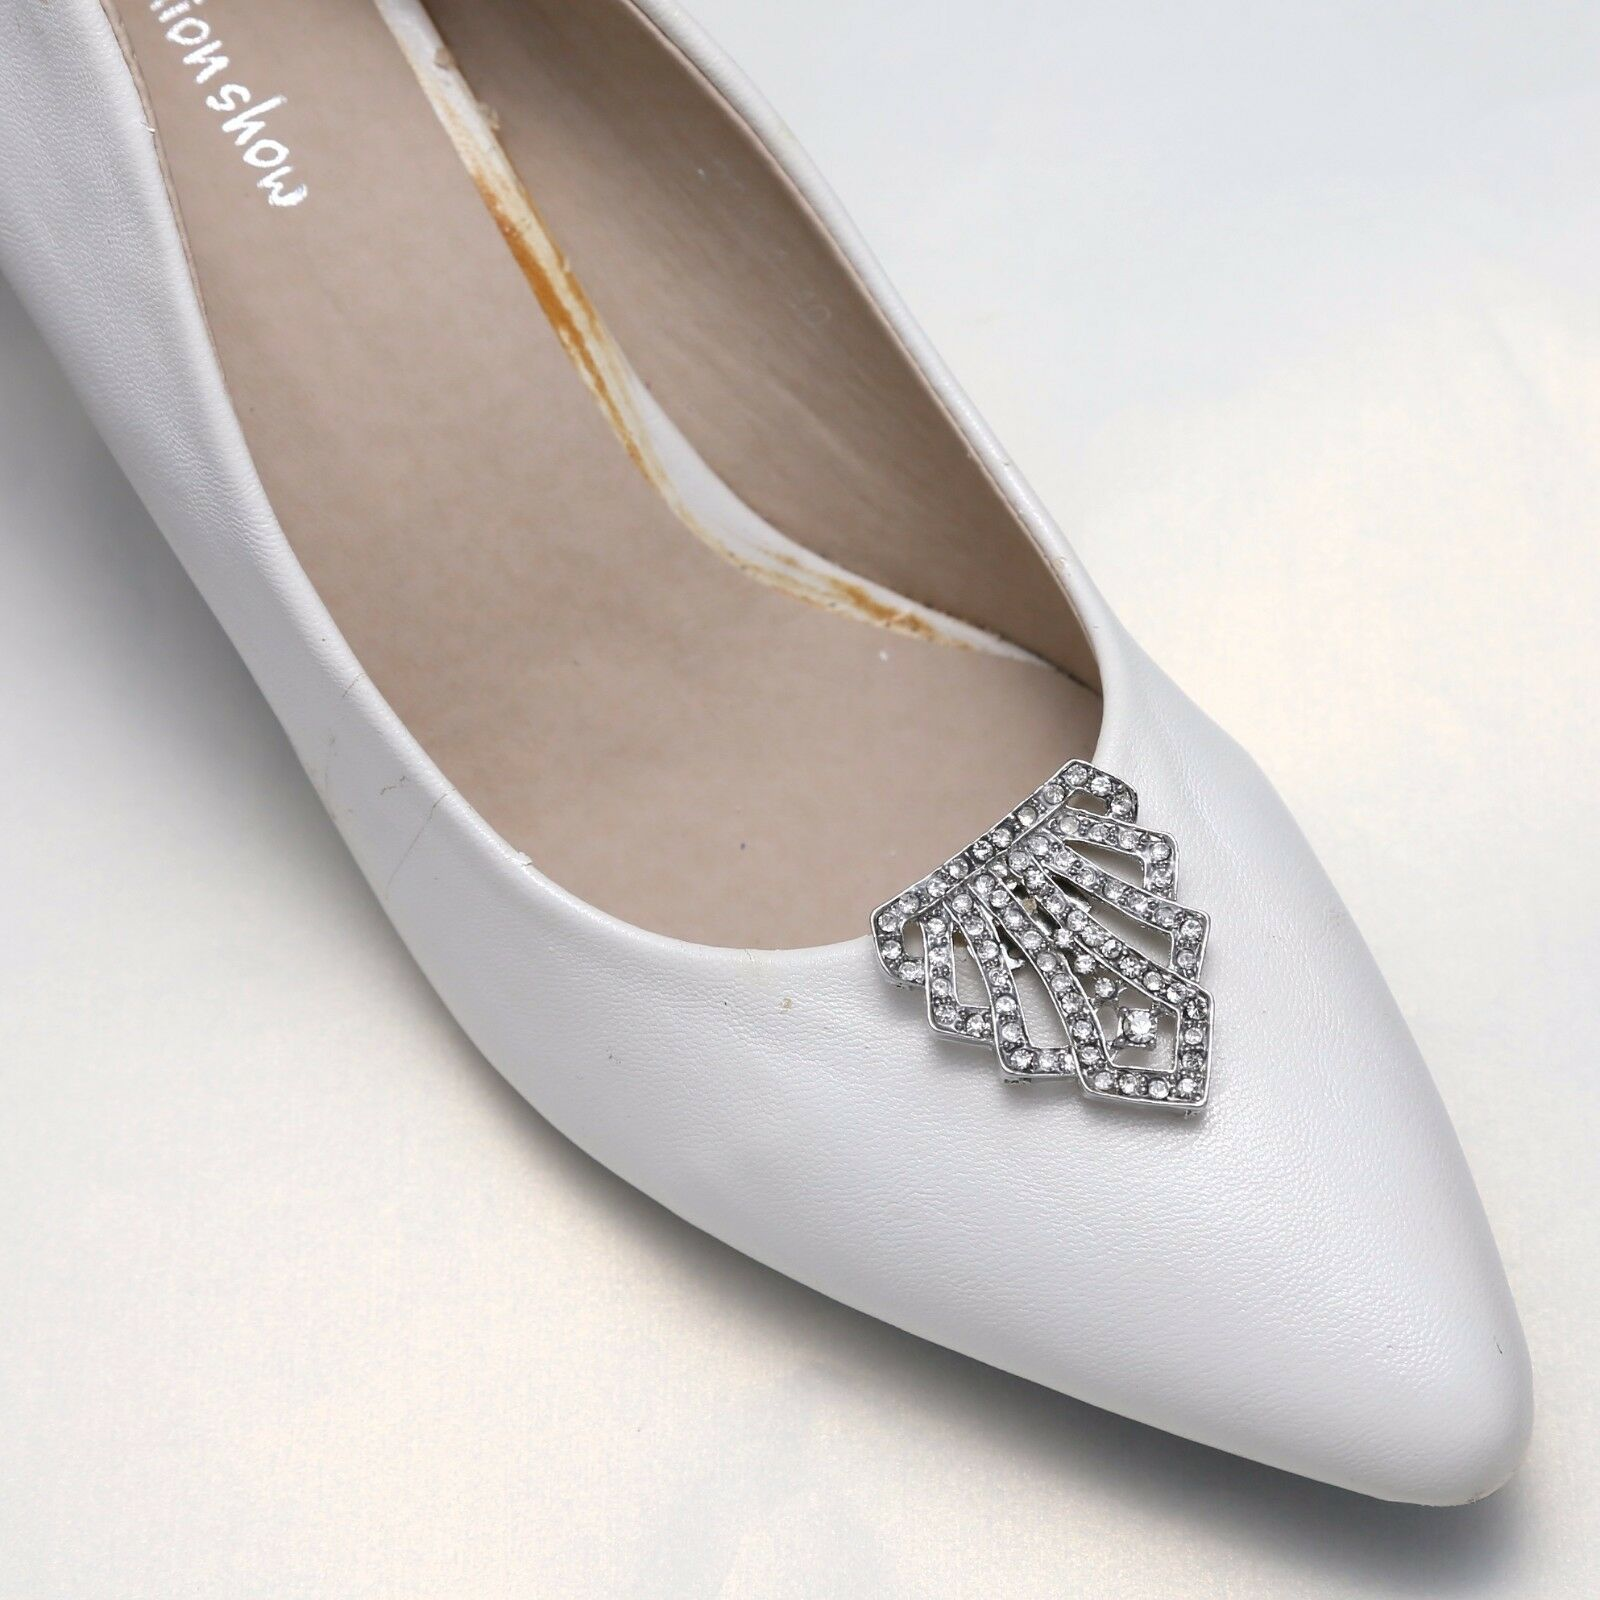 Vintage Style Motif Diamante Rhinestone Wedding Bridal High Heel Shoe Clips Pair